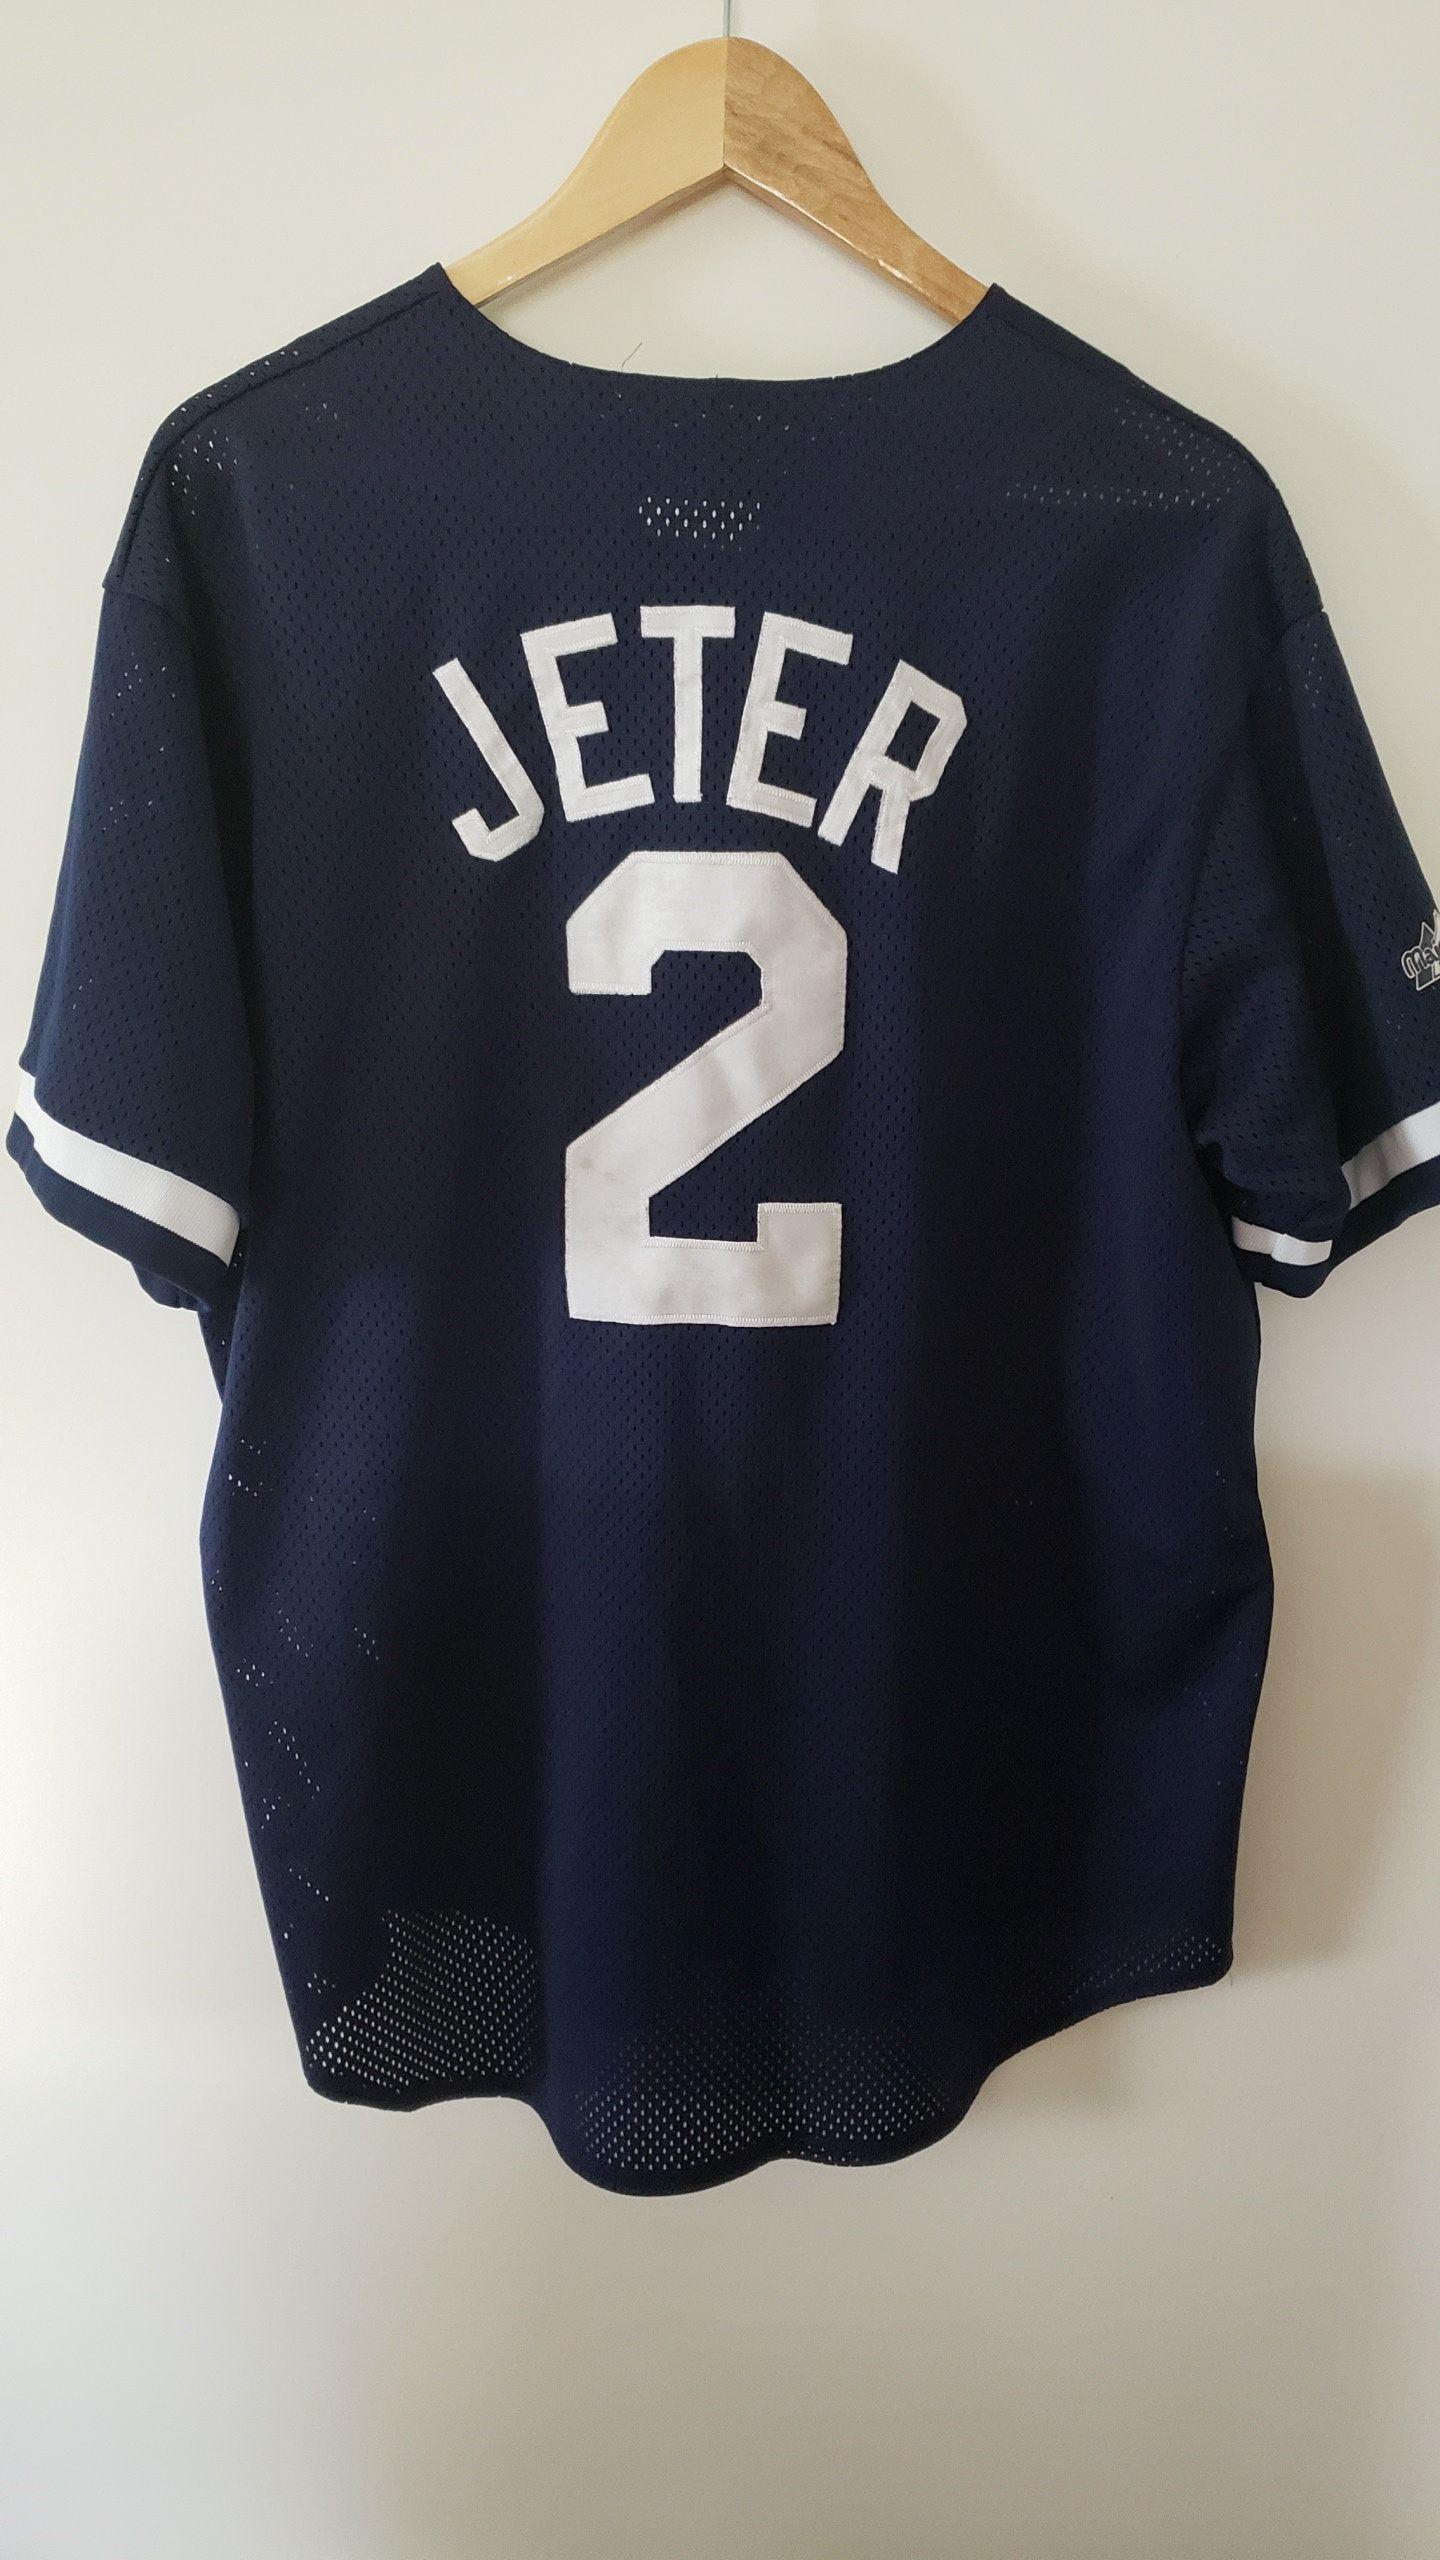 finest selection db699 d5a2c Xl Stitched Rackraidersvtg com Vintage - Yankees Jeter Urban ...